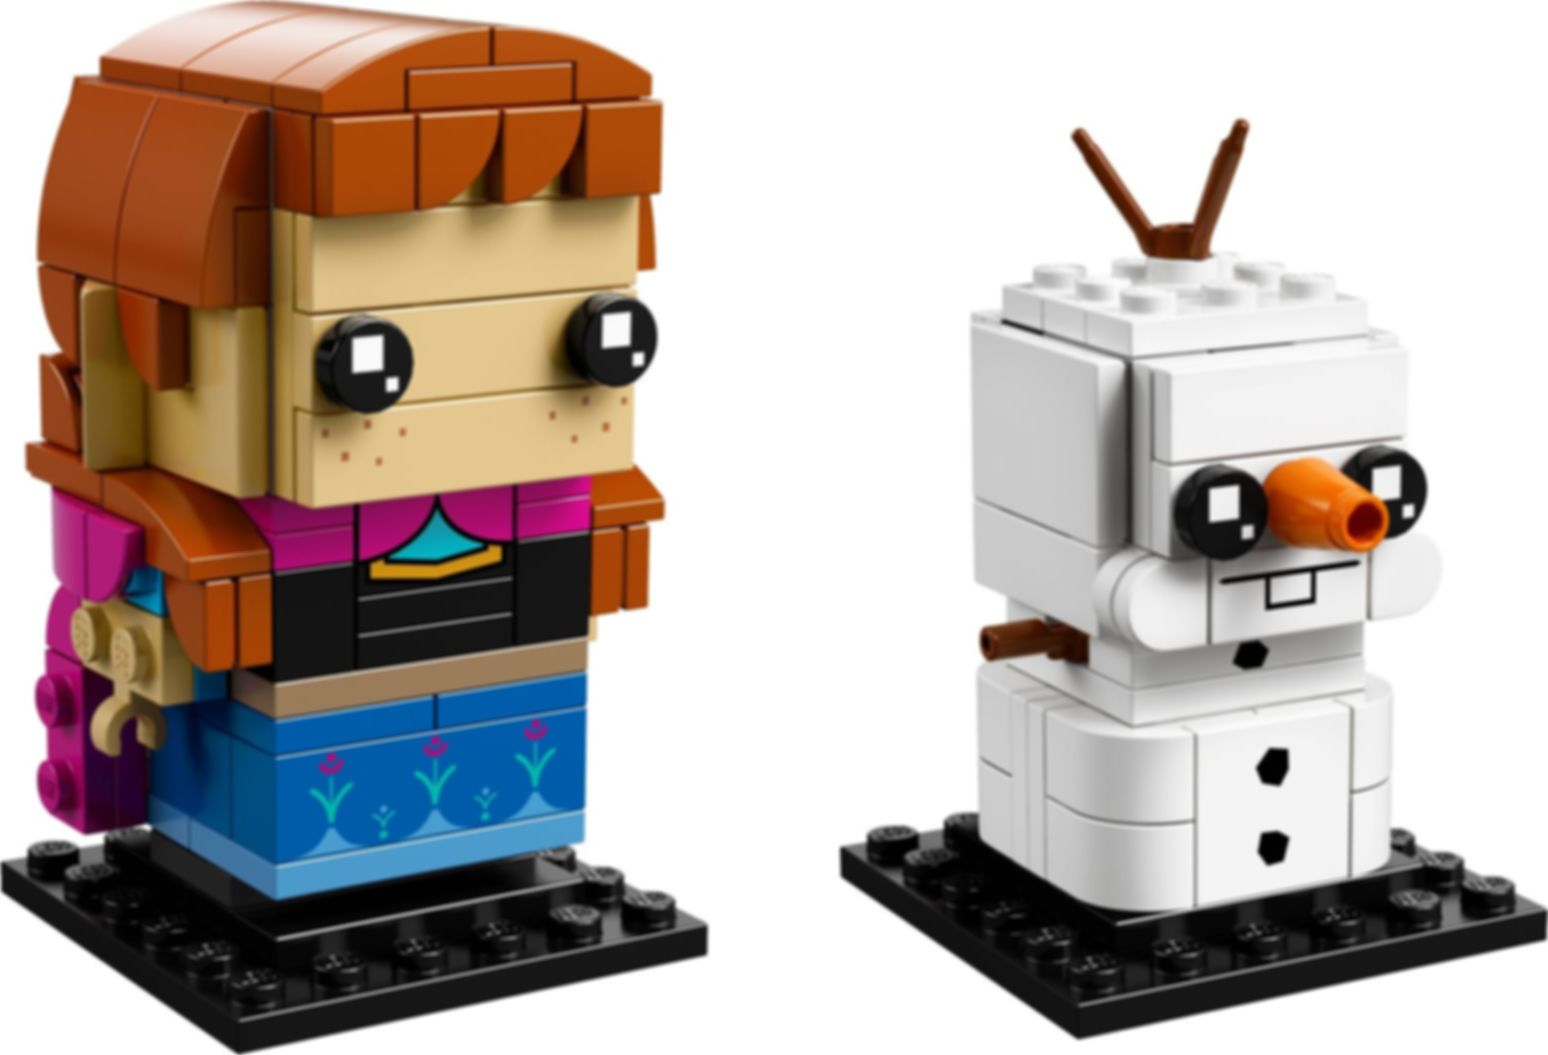 LEGO® BrickHeadz™ Anna & Olaf components